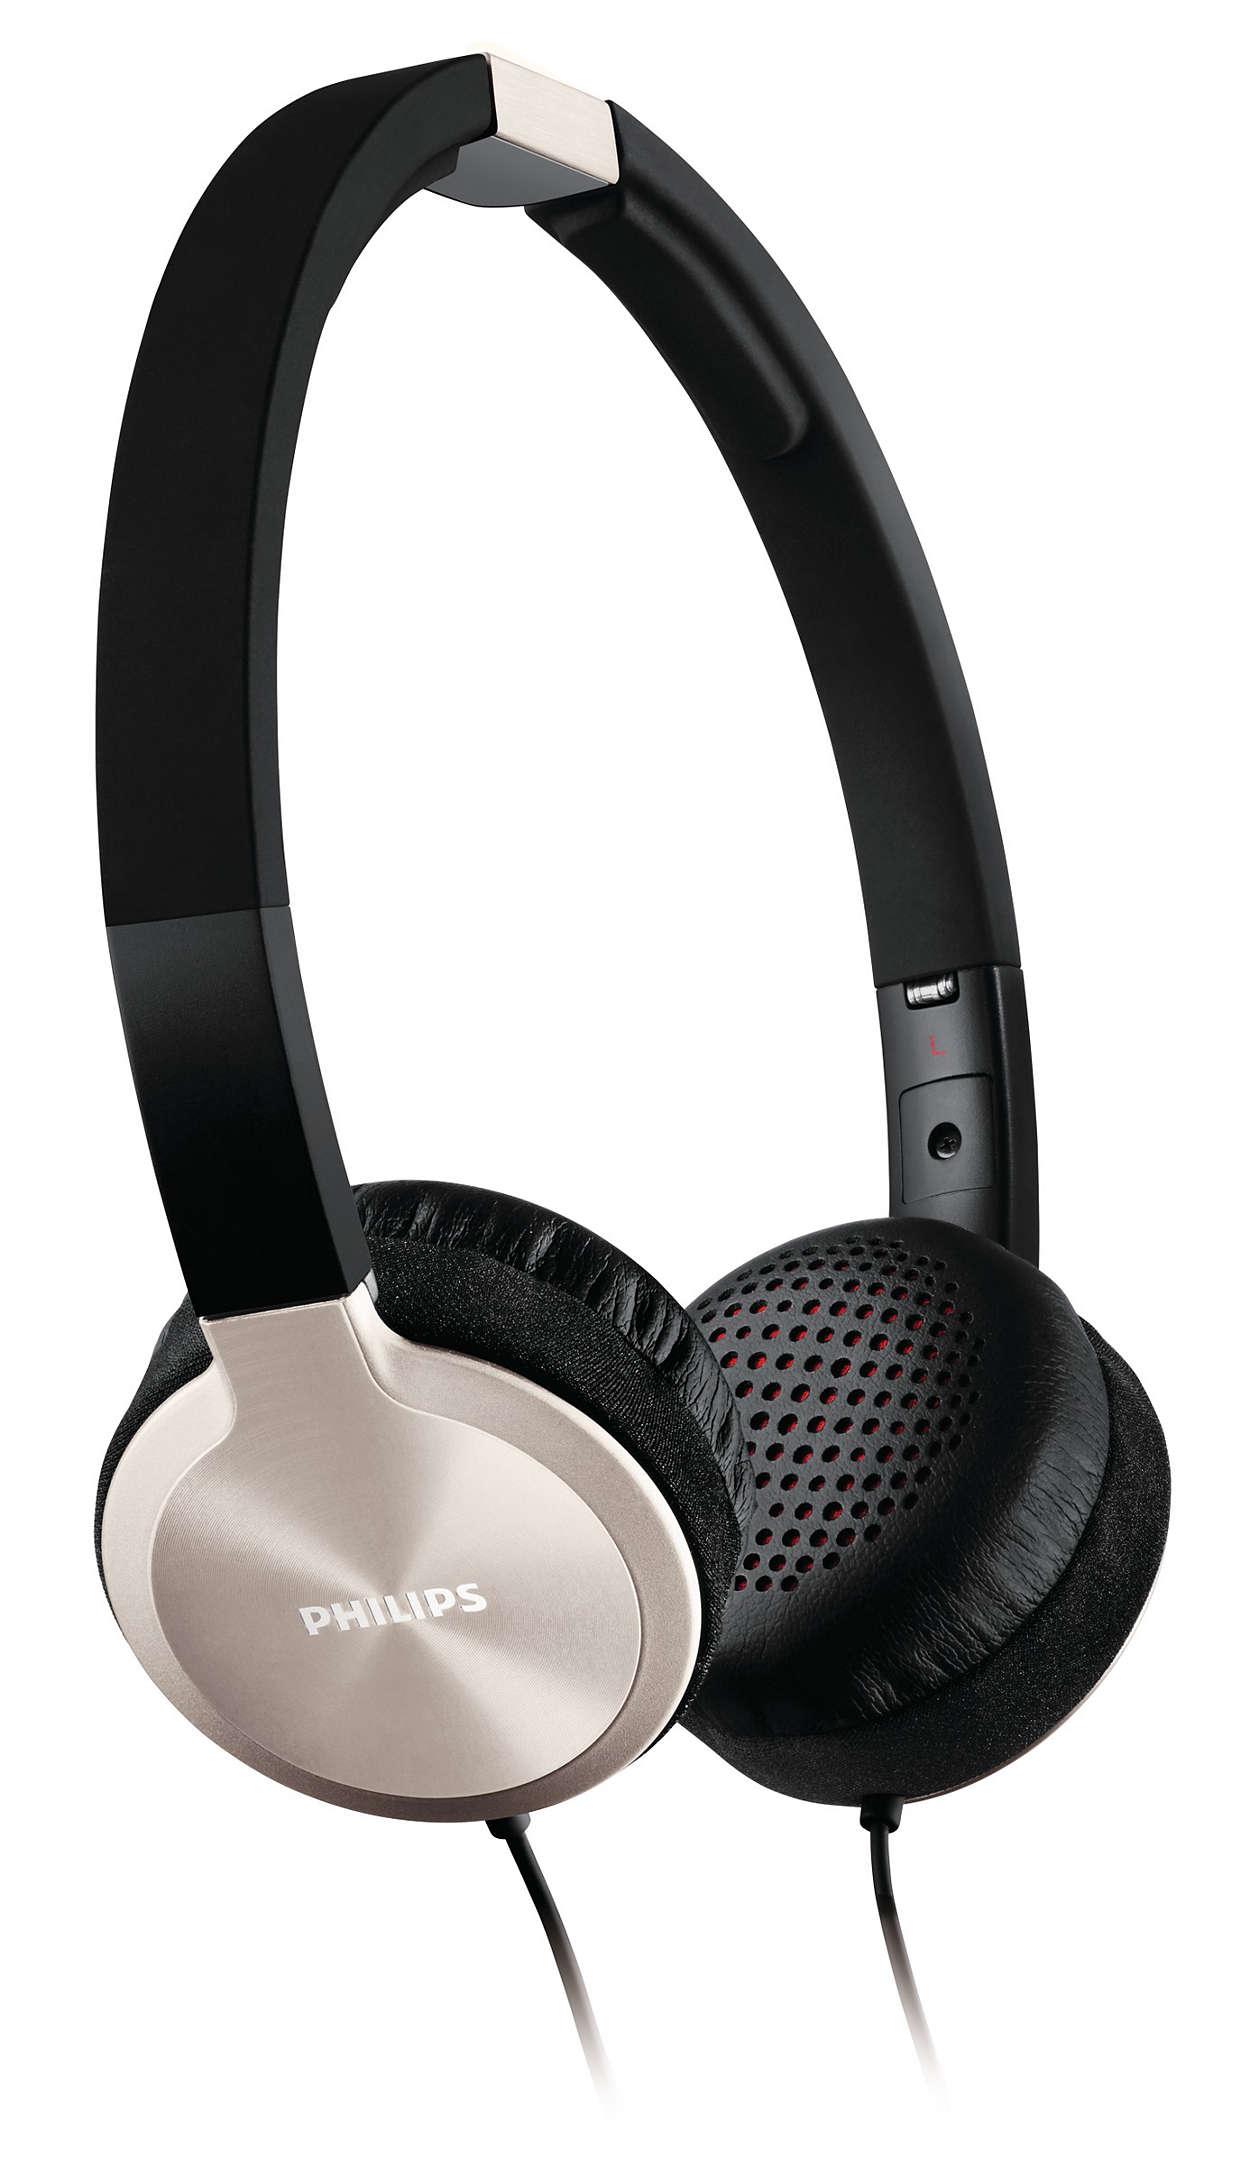 Precise sound, ultra-compact